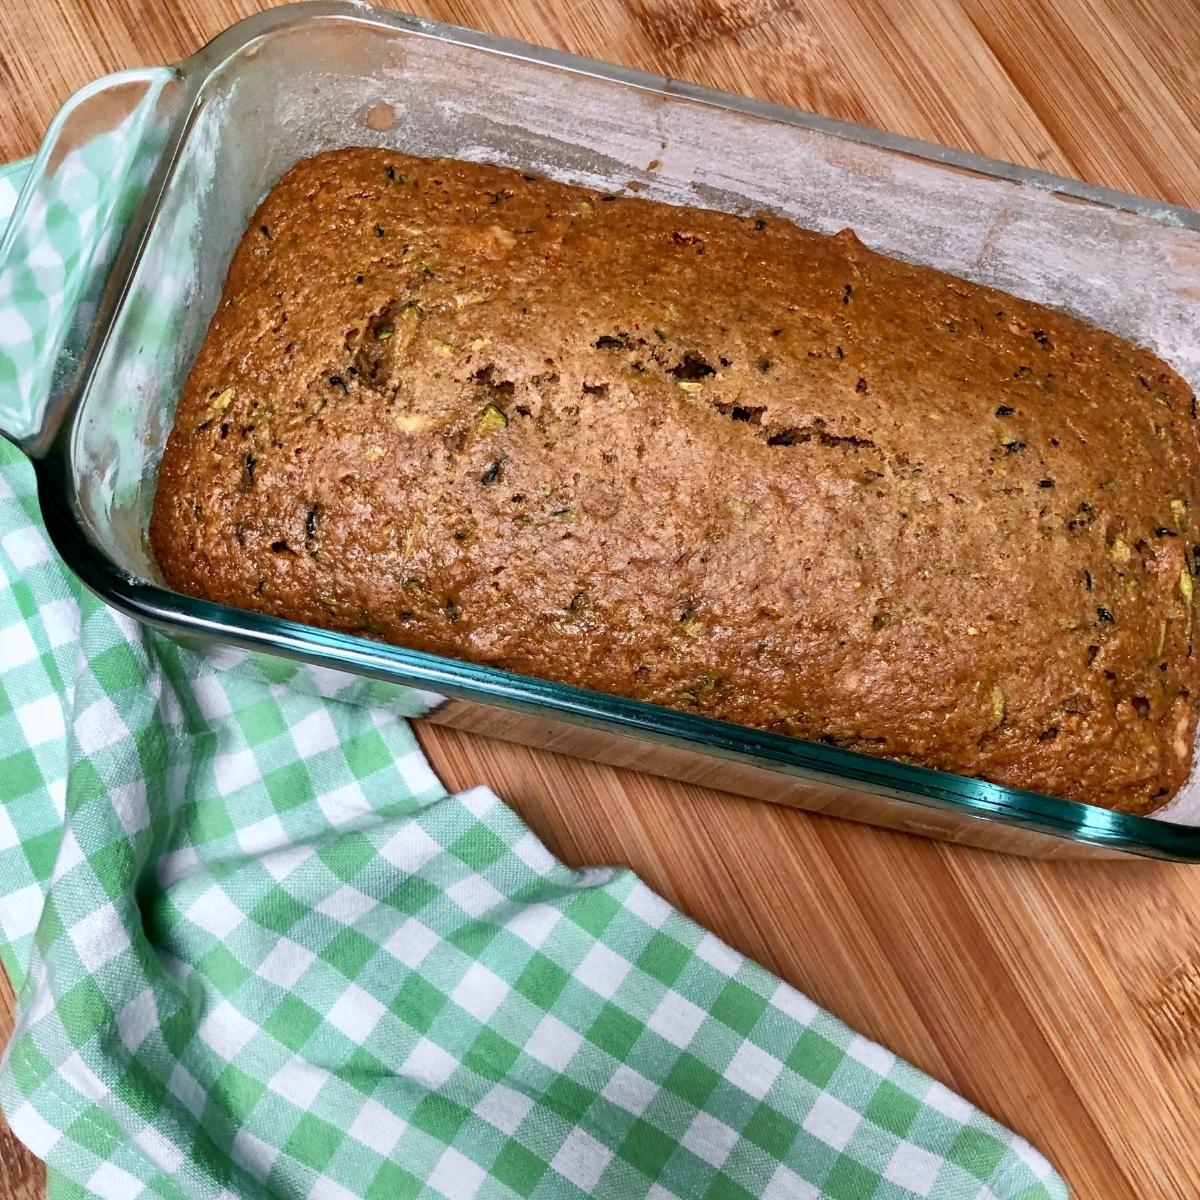 Baked vegan zucchini bread inside loaf pan.